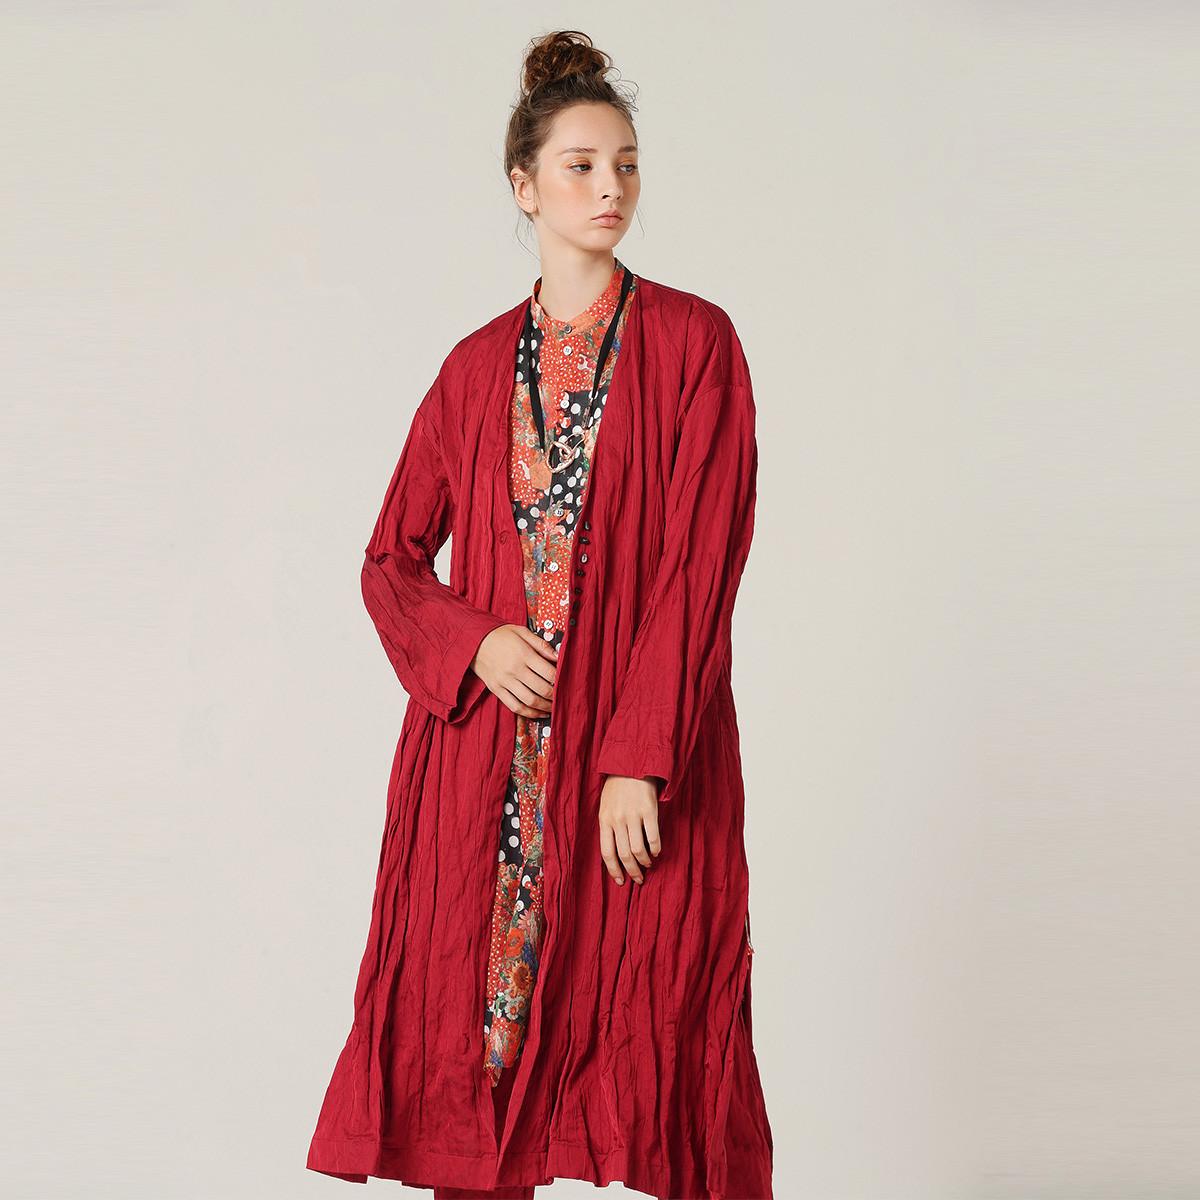 EINPURE TEA茶愫褶皱长款外套女装2019新款秋季时尚文艺设计感风衣TH1003031315